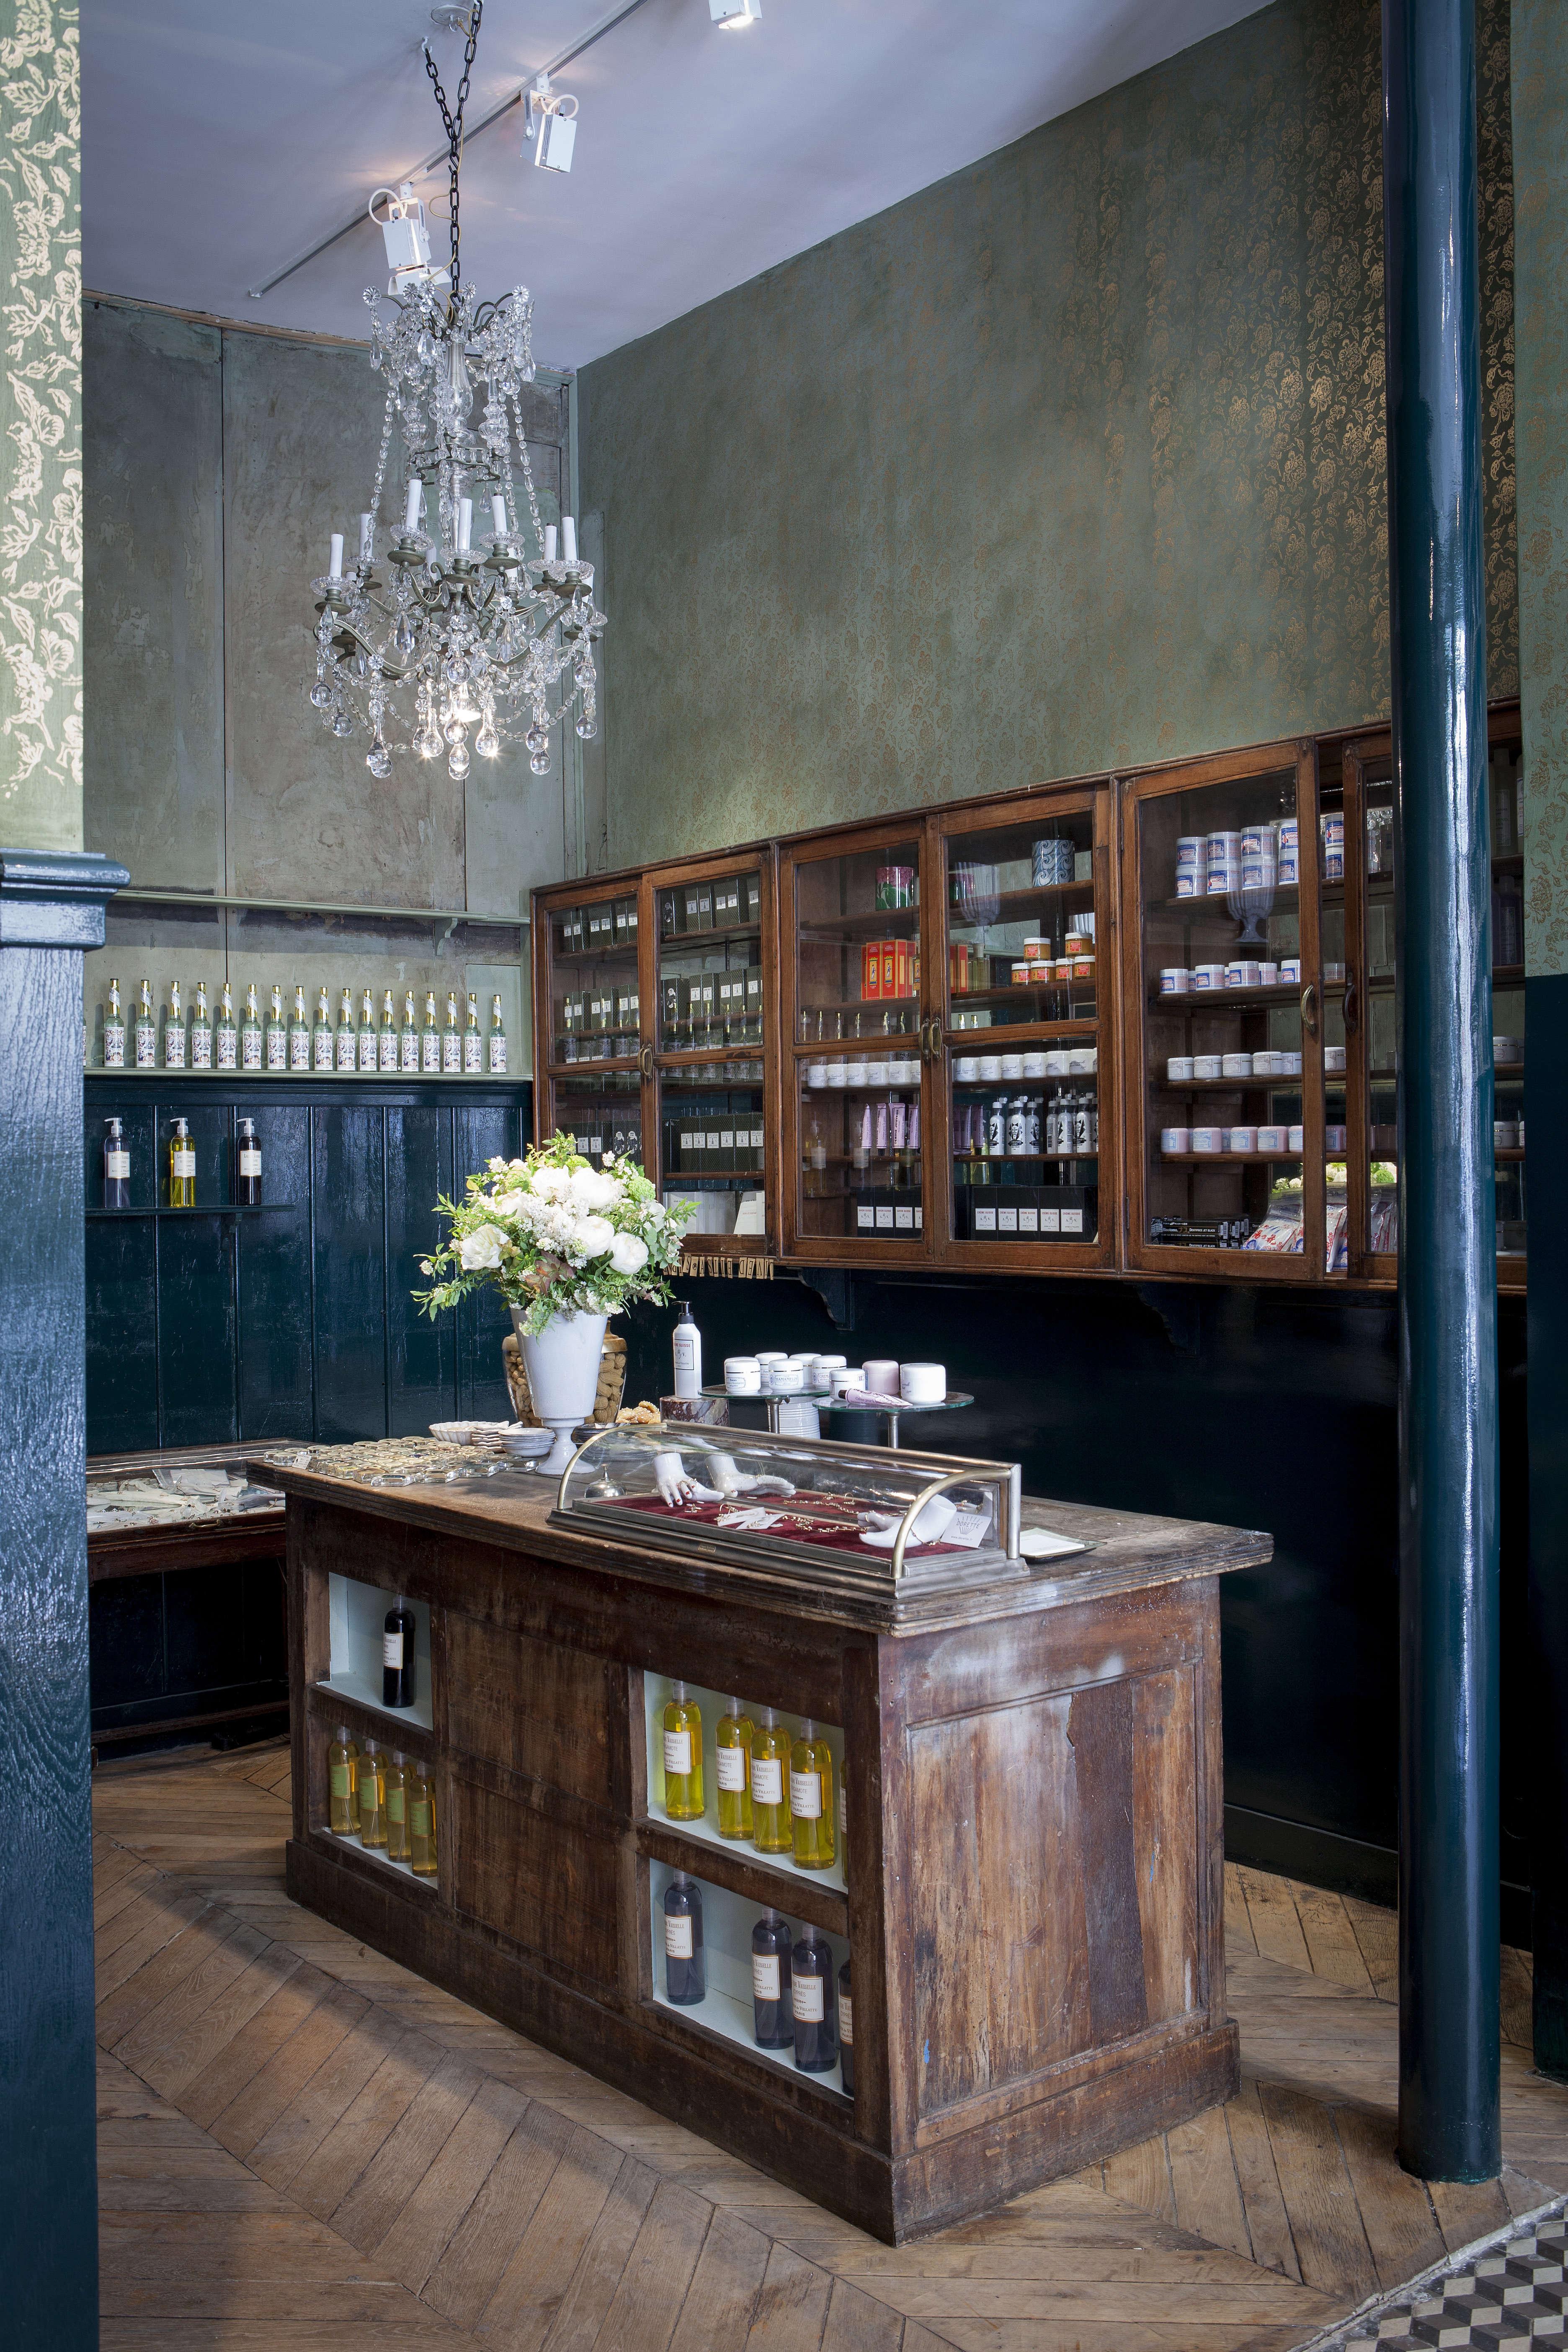 Astier de Villatte's new 6 Rue de Tournon in Paris | Remodelista